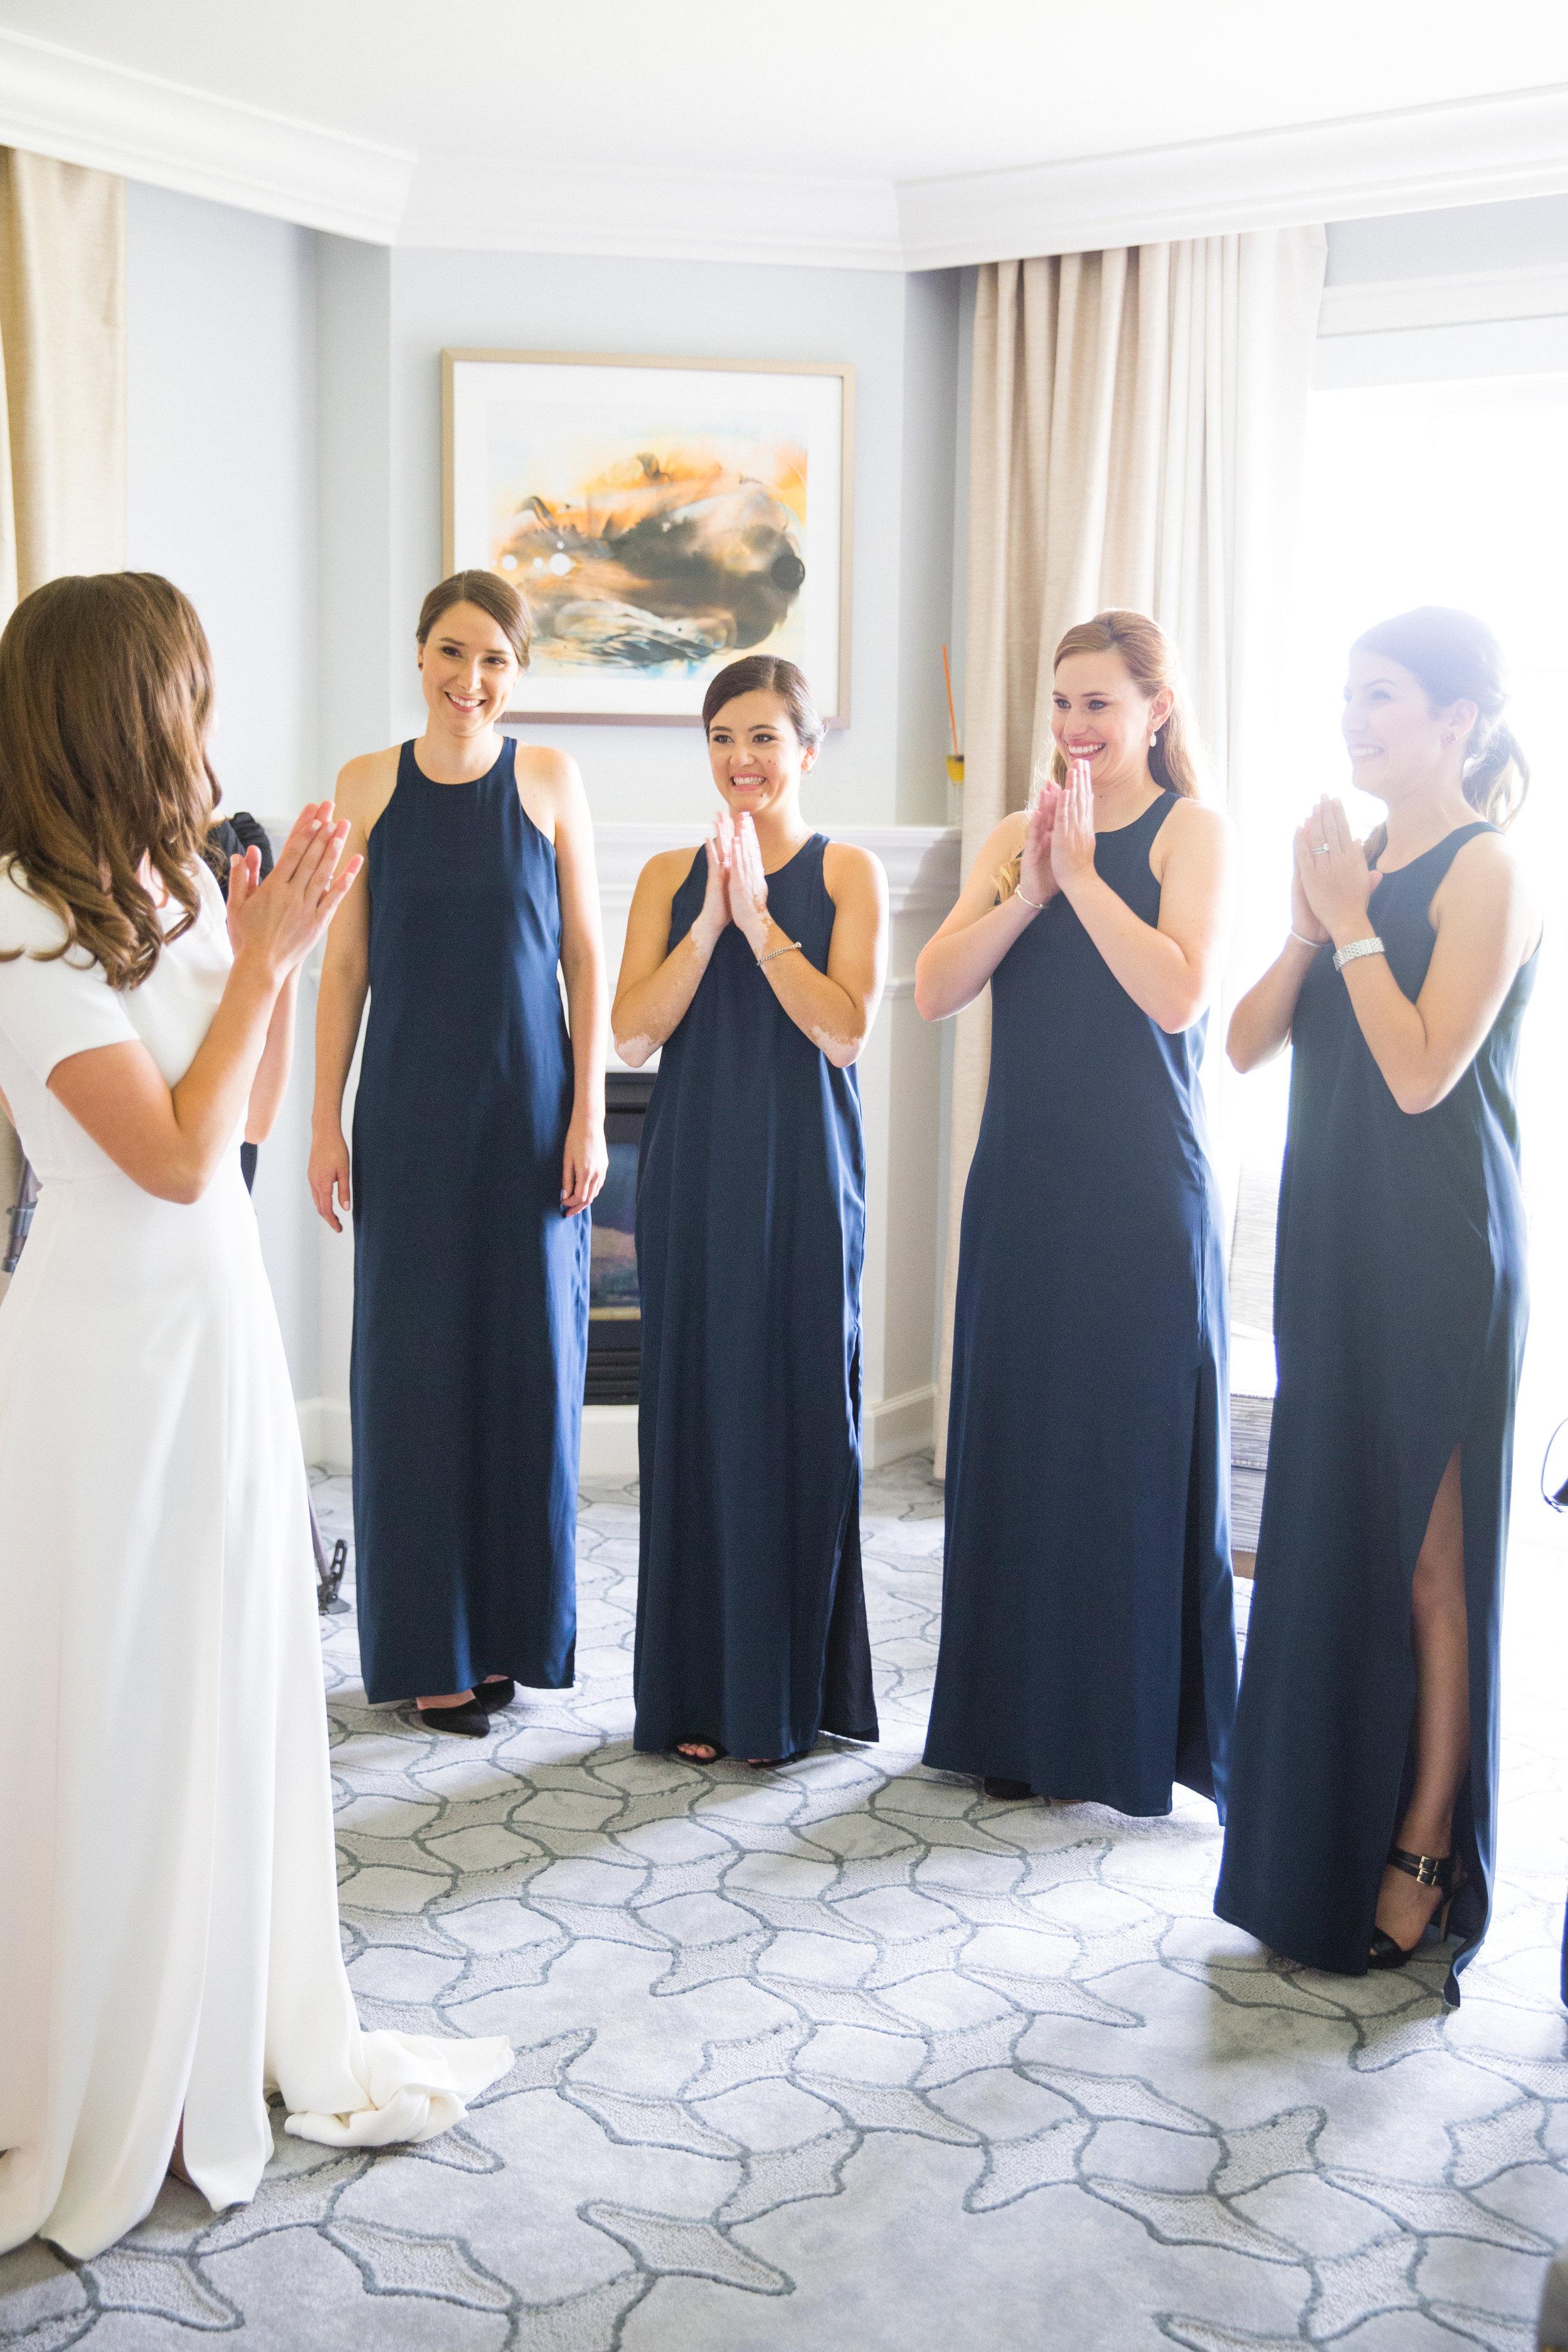 larissa-cleveland-sivanjeremy-wedding-0117-2.jpg